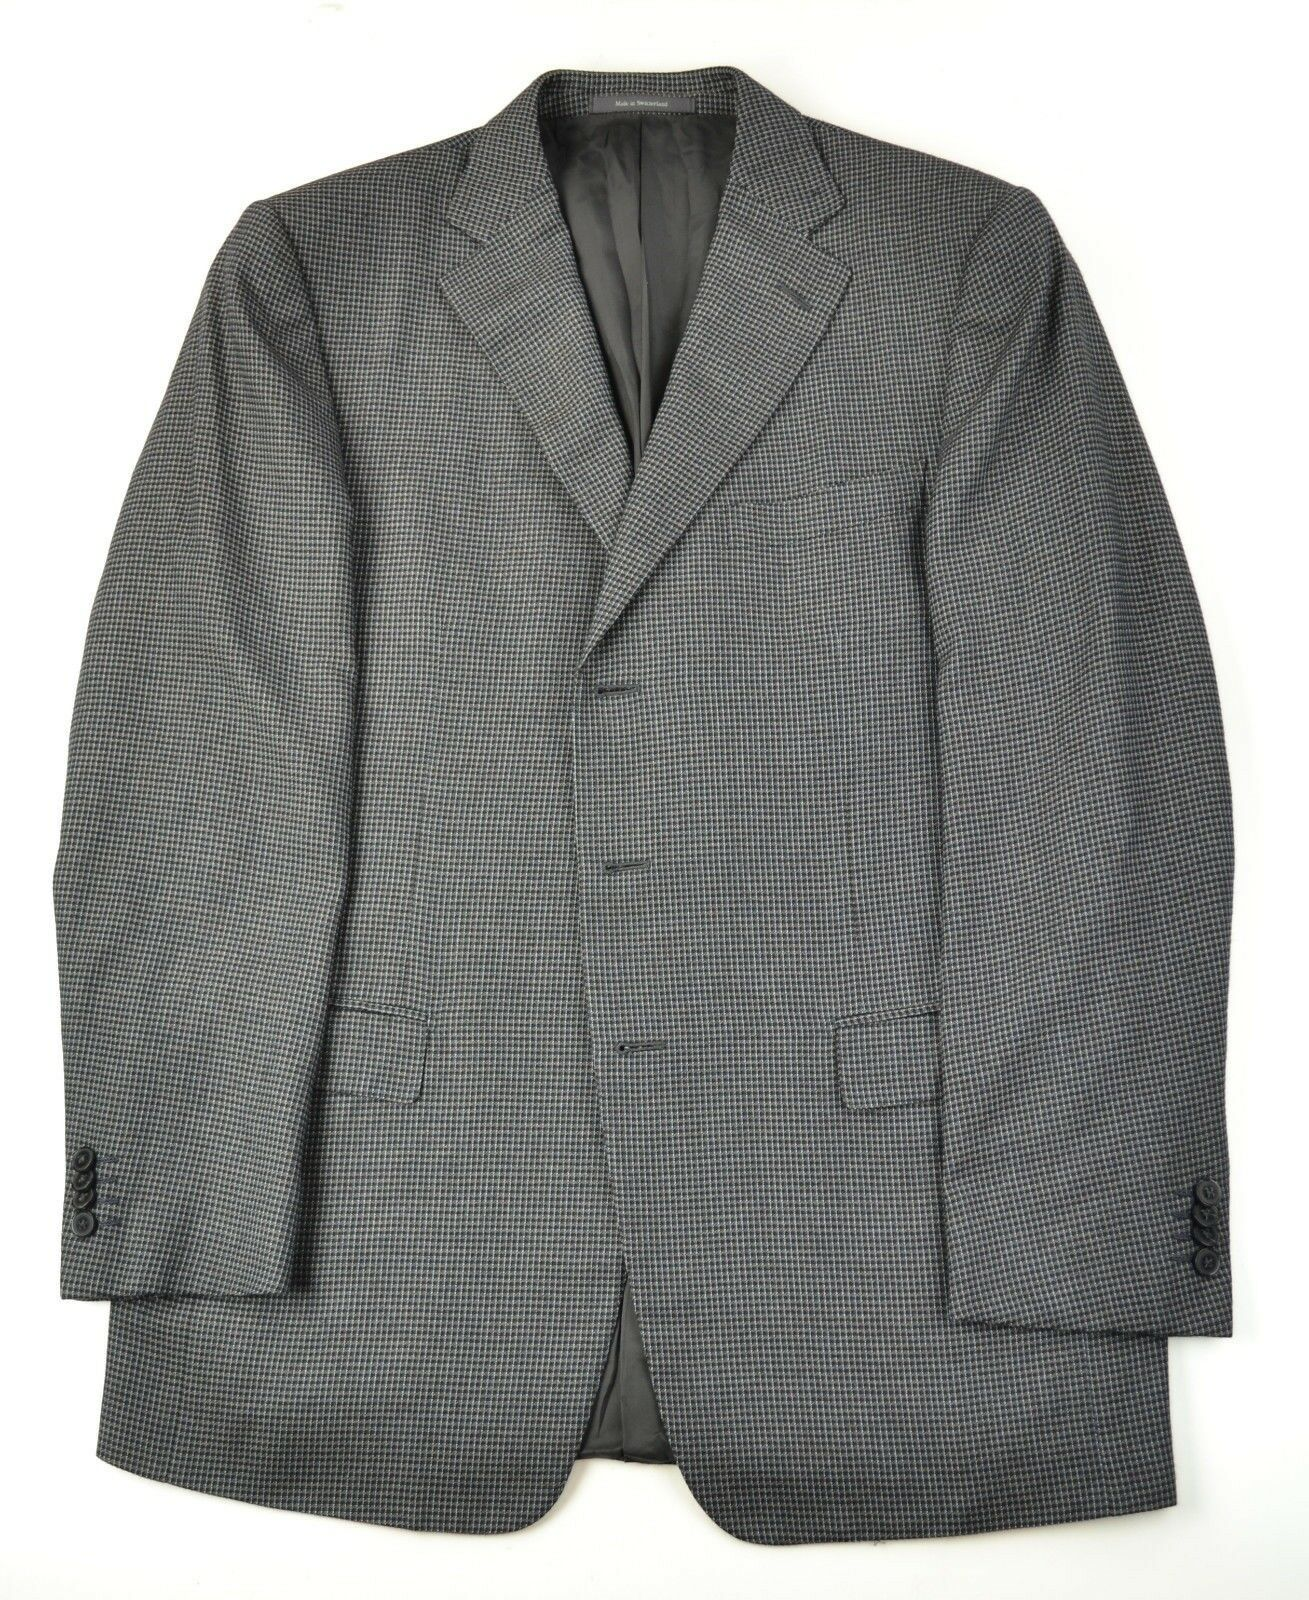 Recent Ermenegildo Zegna Dual Vent Silk Cashmere Roma Fit Woven Woven Fit Sportcoat 42 42r a7e052